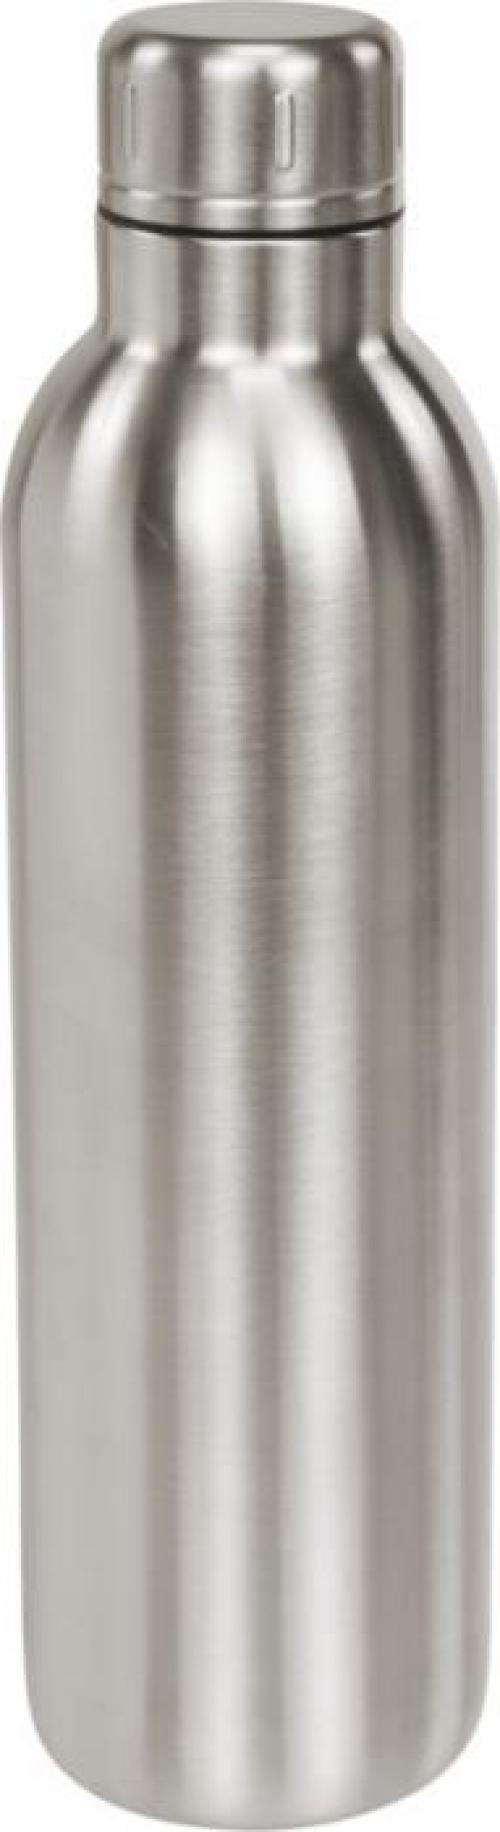 Bidón deportivo con aislante de cobre al vacío de 510ml Thor